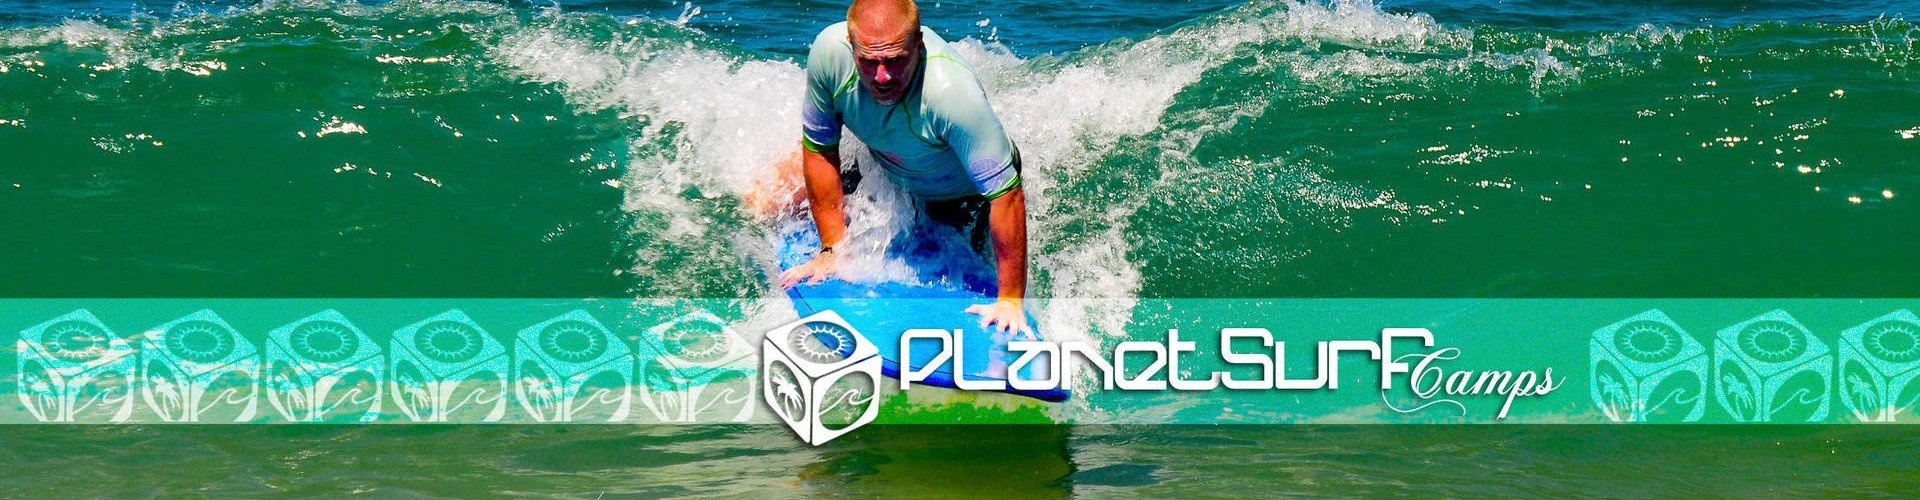 Professionelle Surfkurs